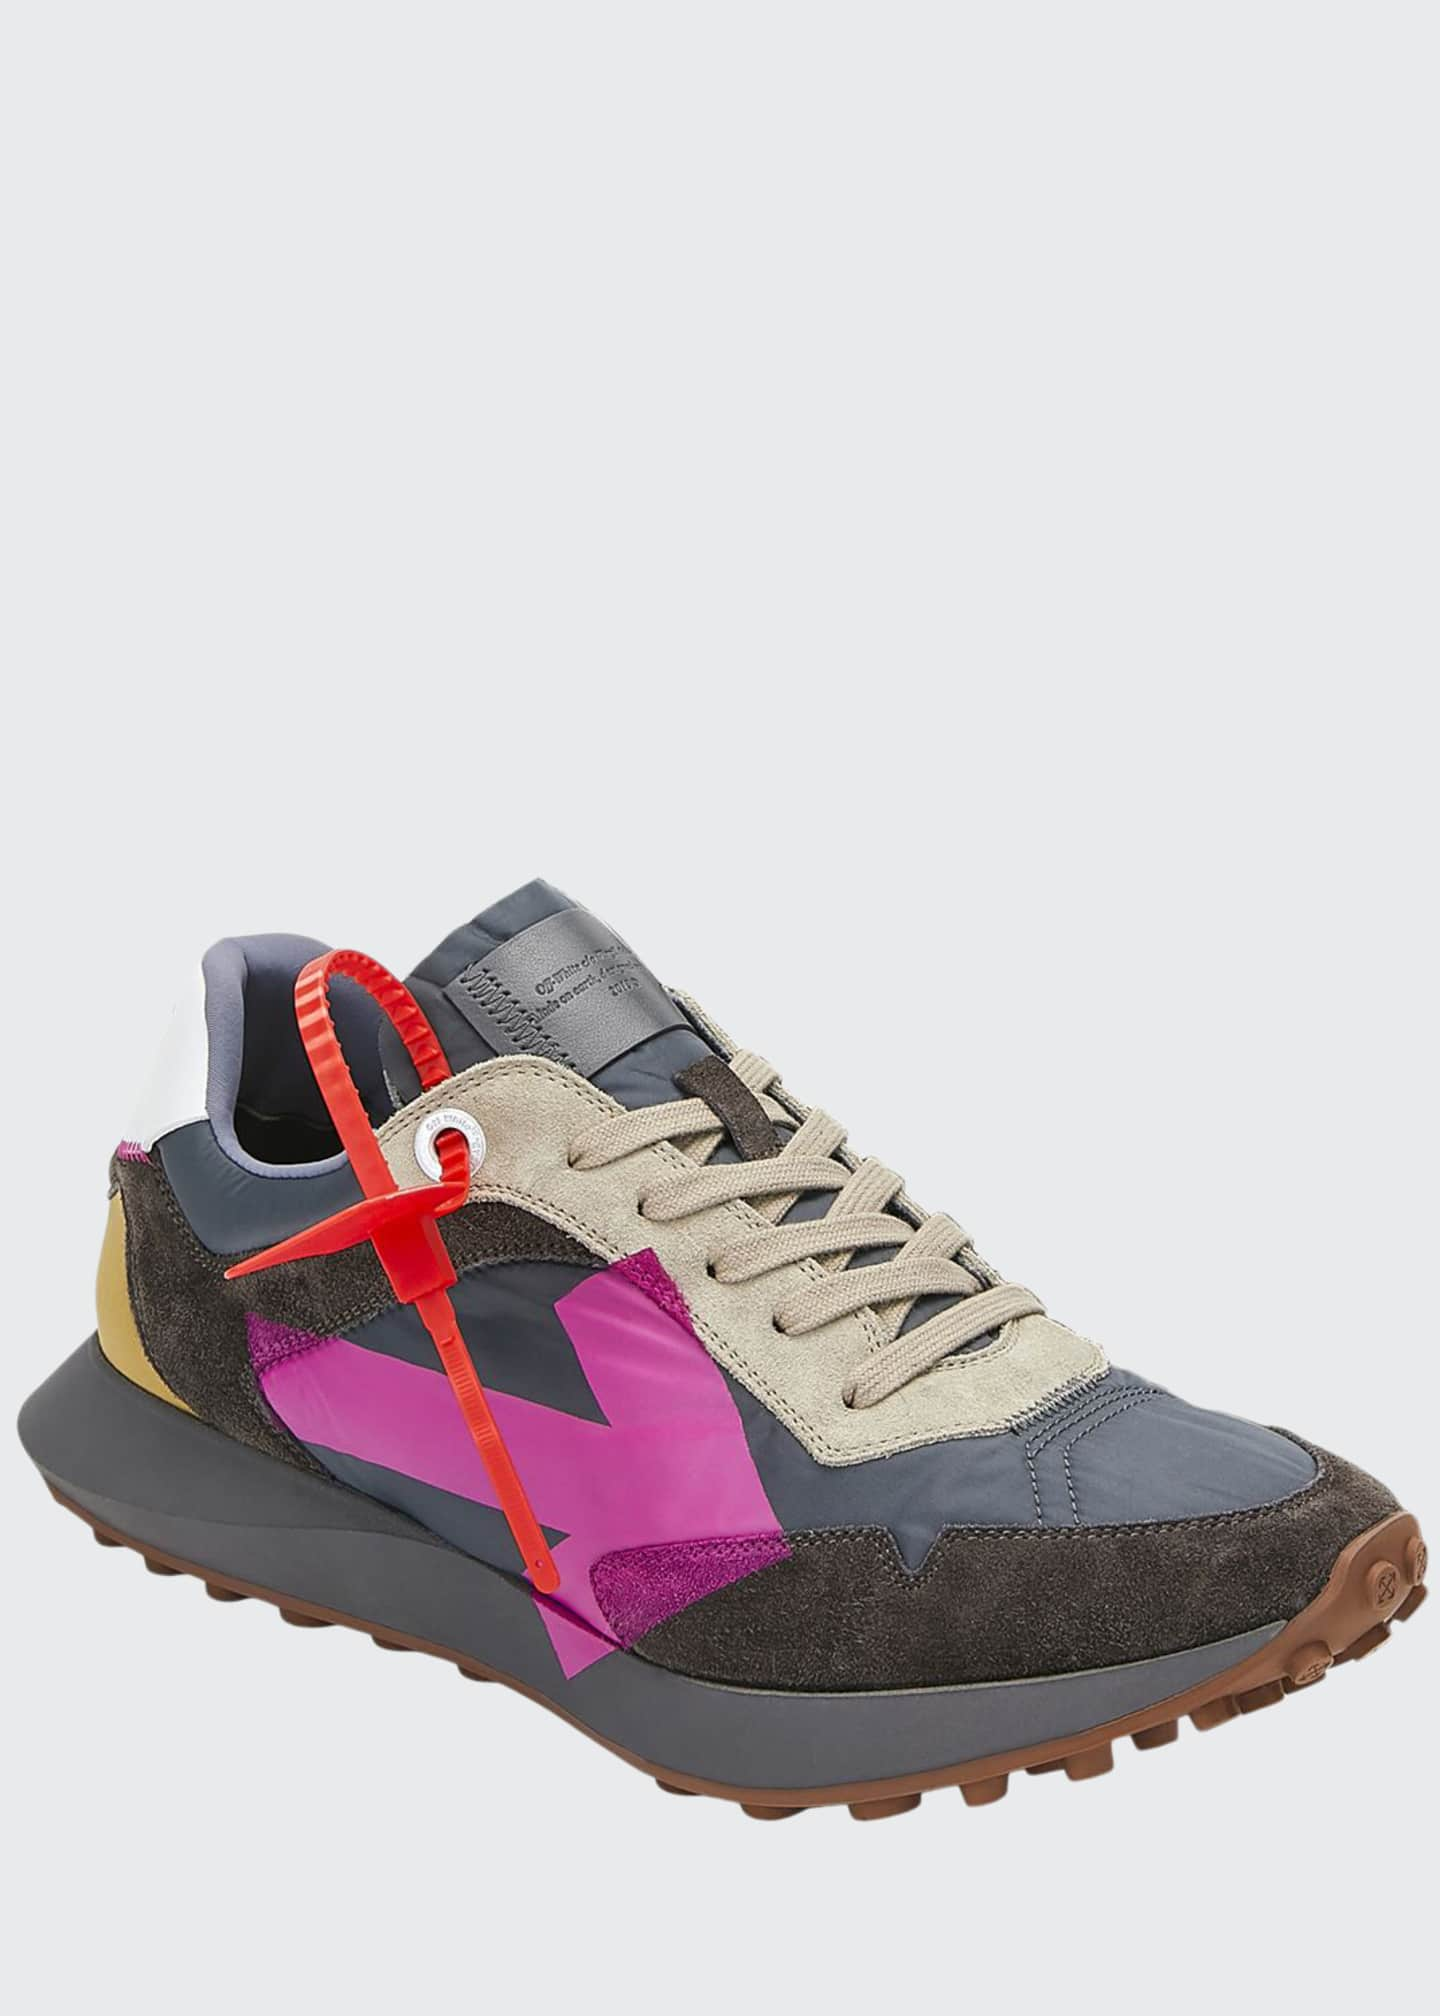 Off-White Men's Arrow Suede-Trim Trainer Sneakers